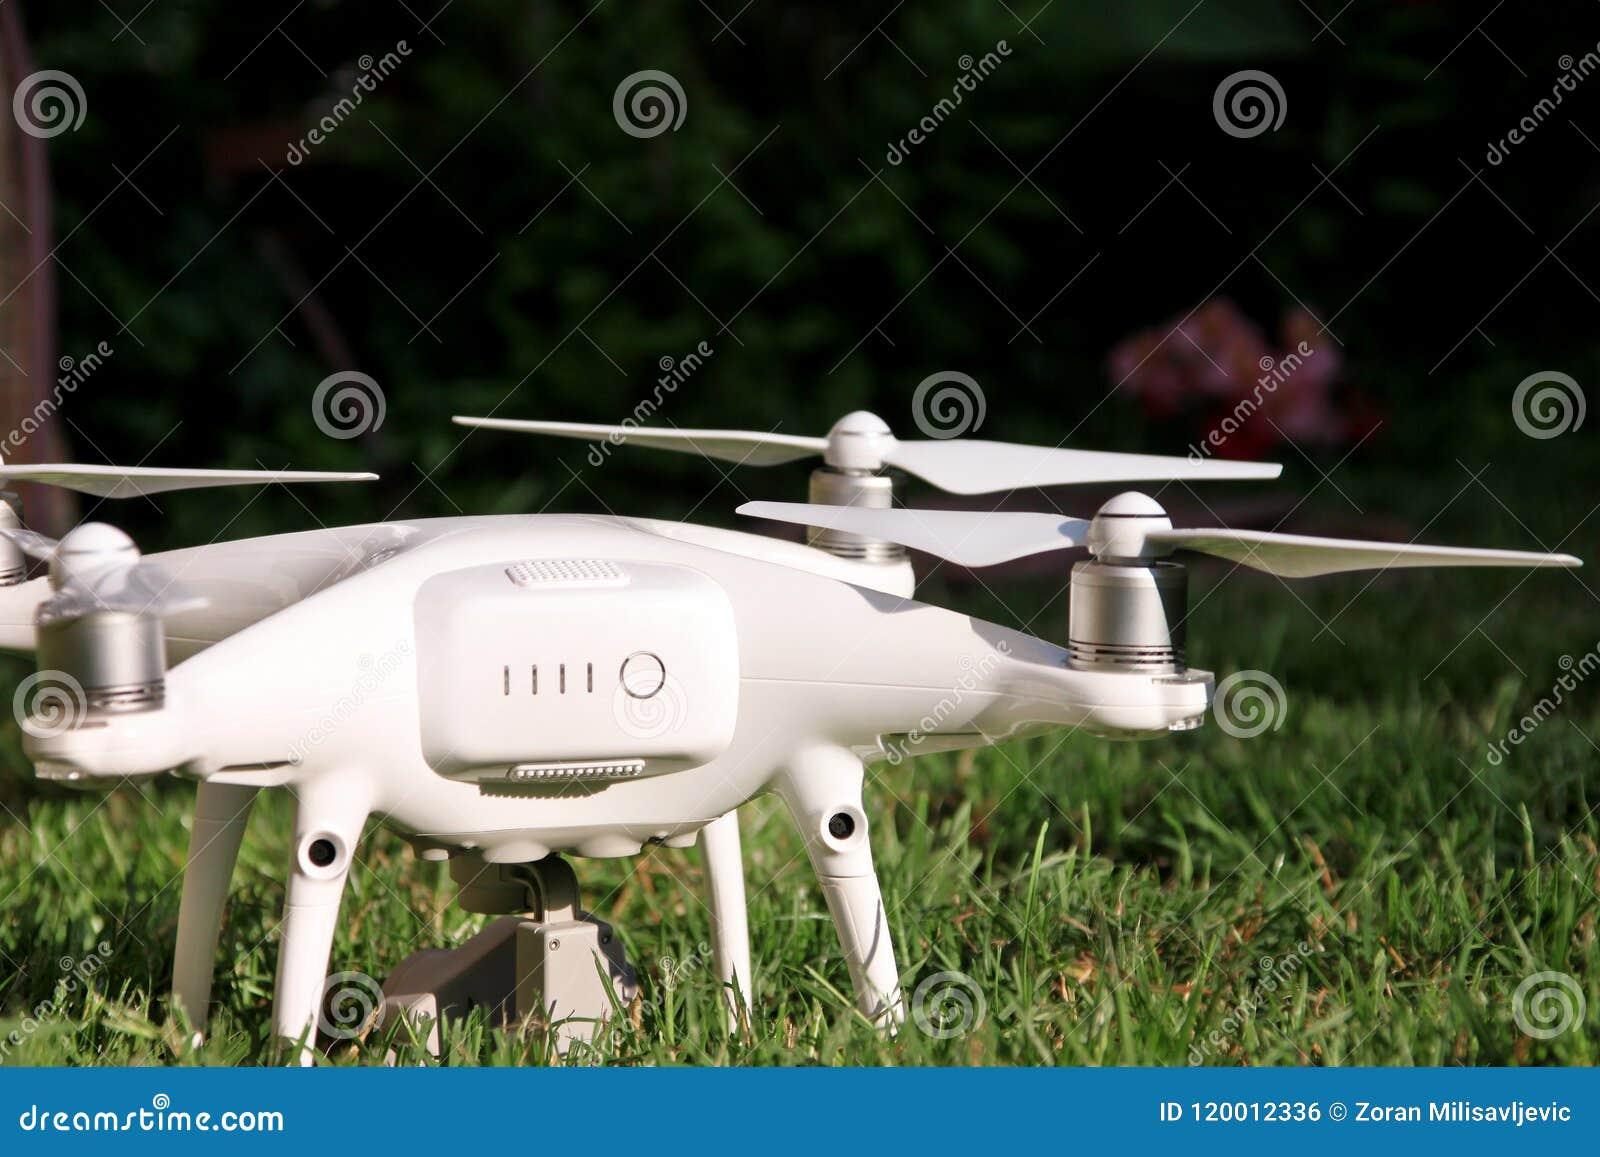 Promotion drone photo hd, avis drone parrot sequoia